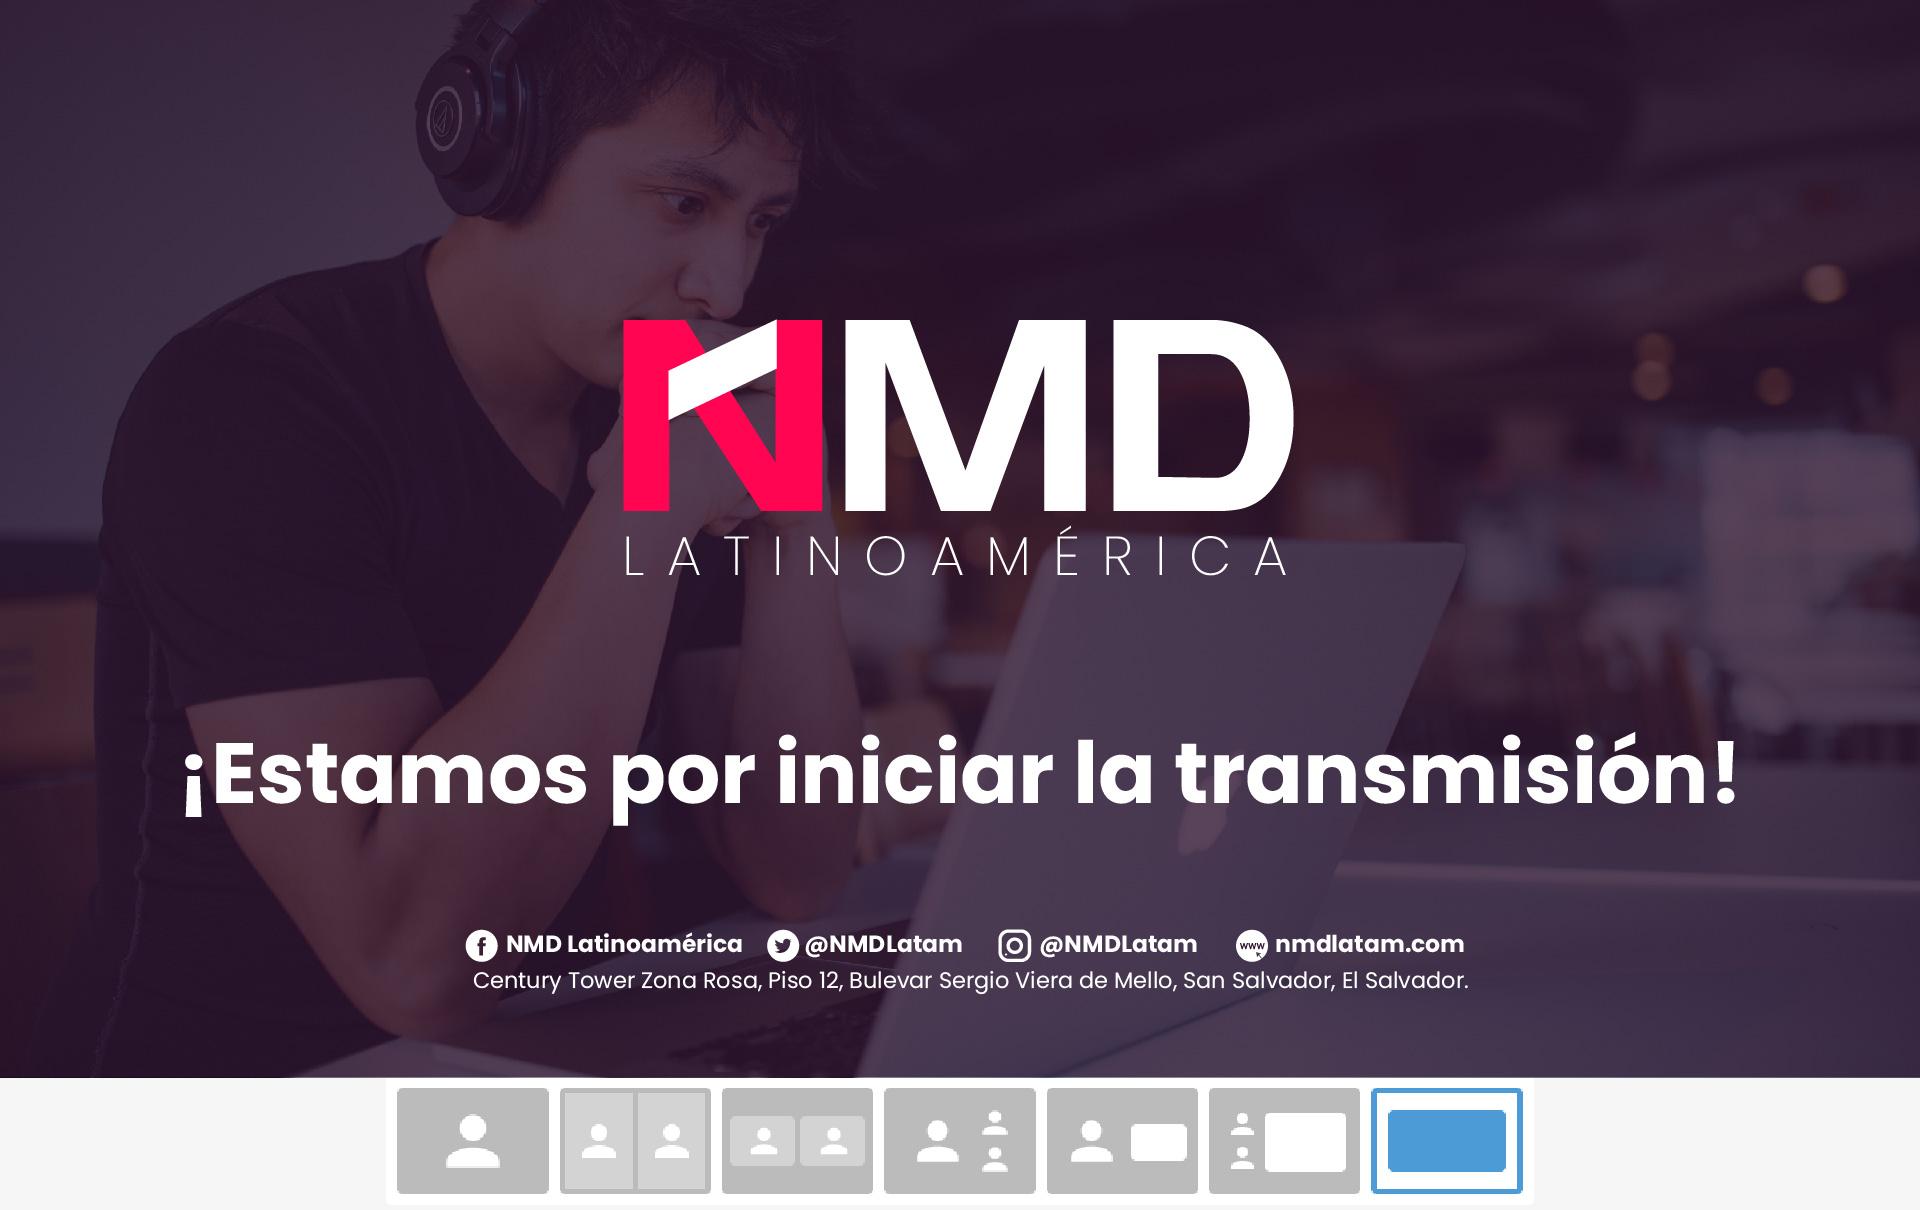 NMD_WEBINARDEMO_LOW_01